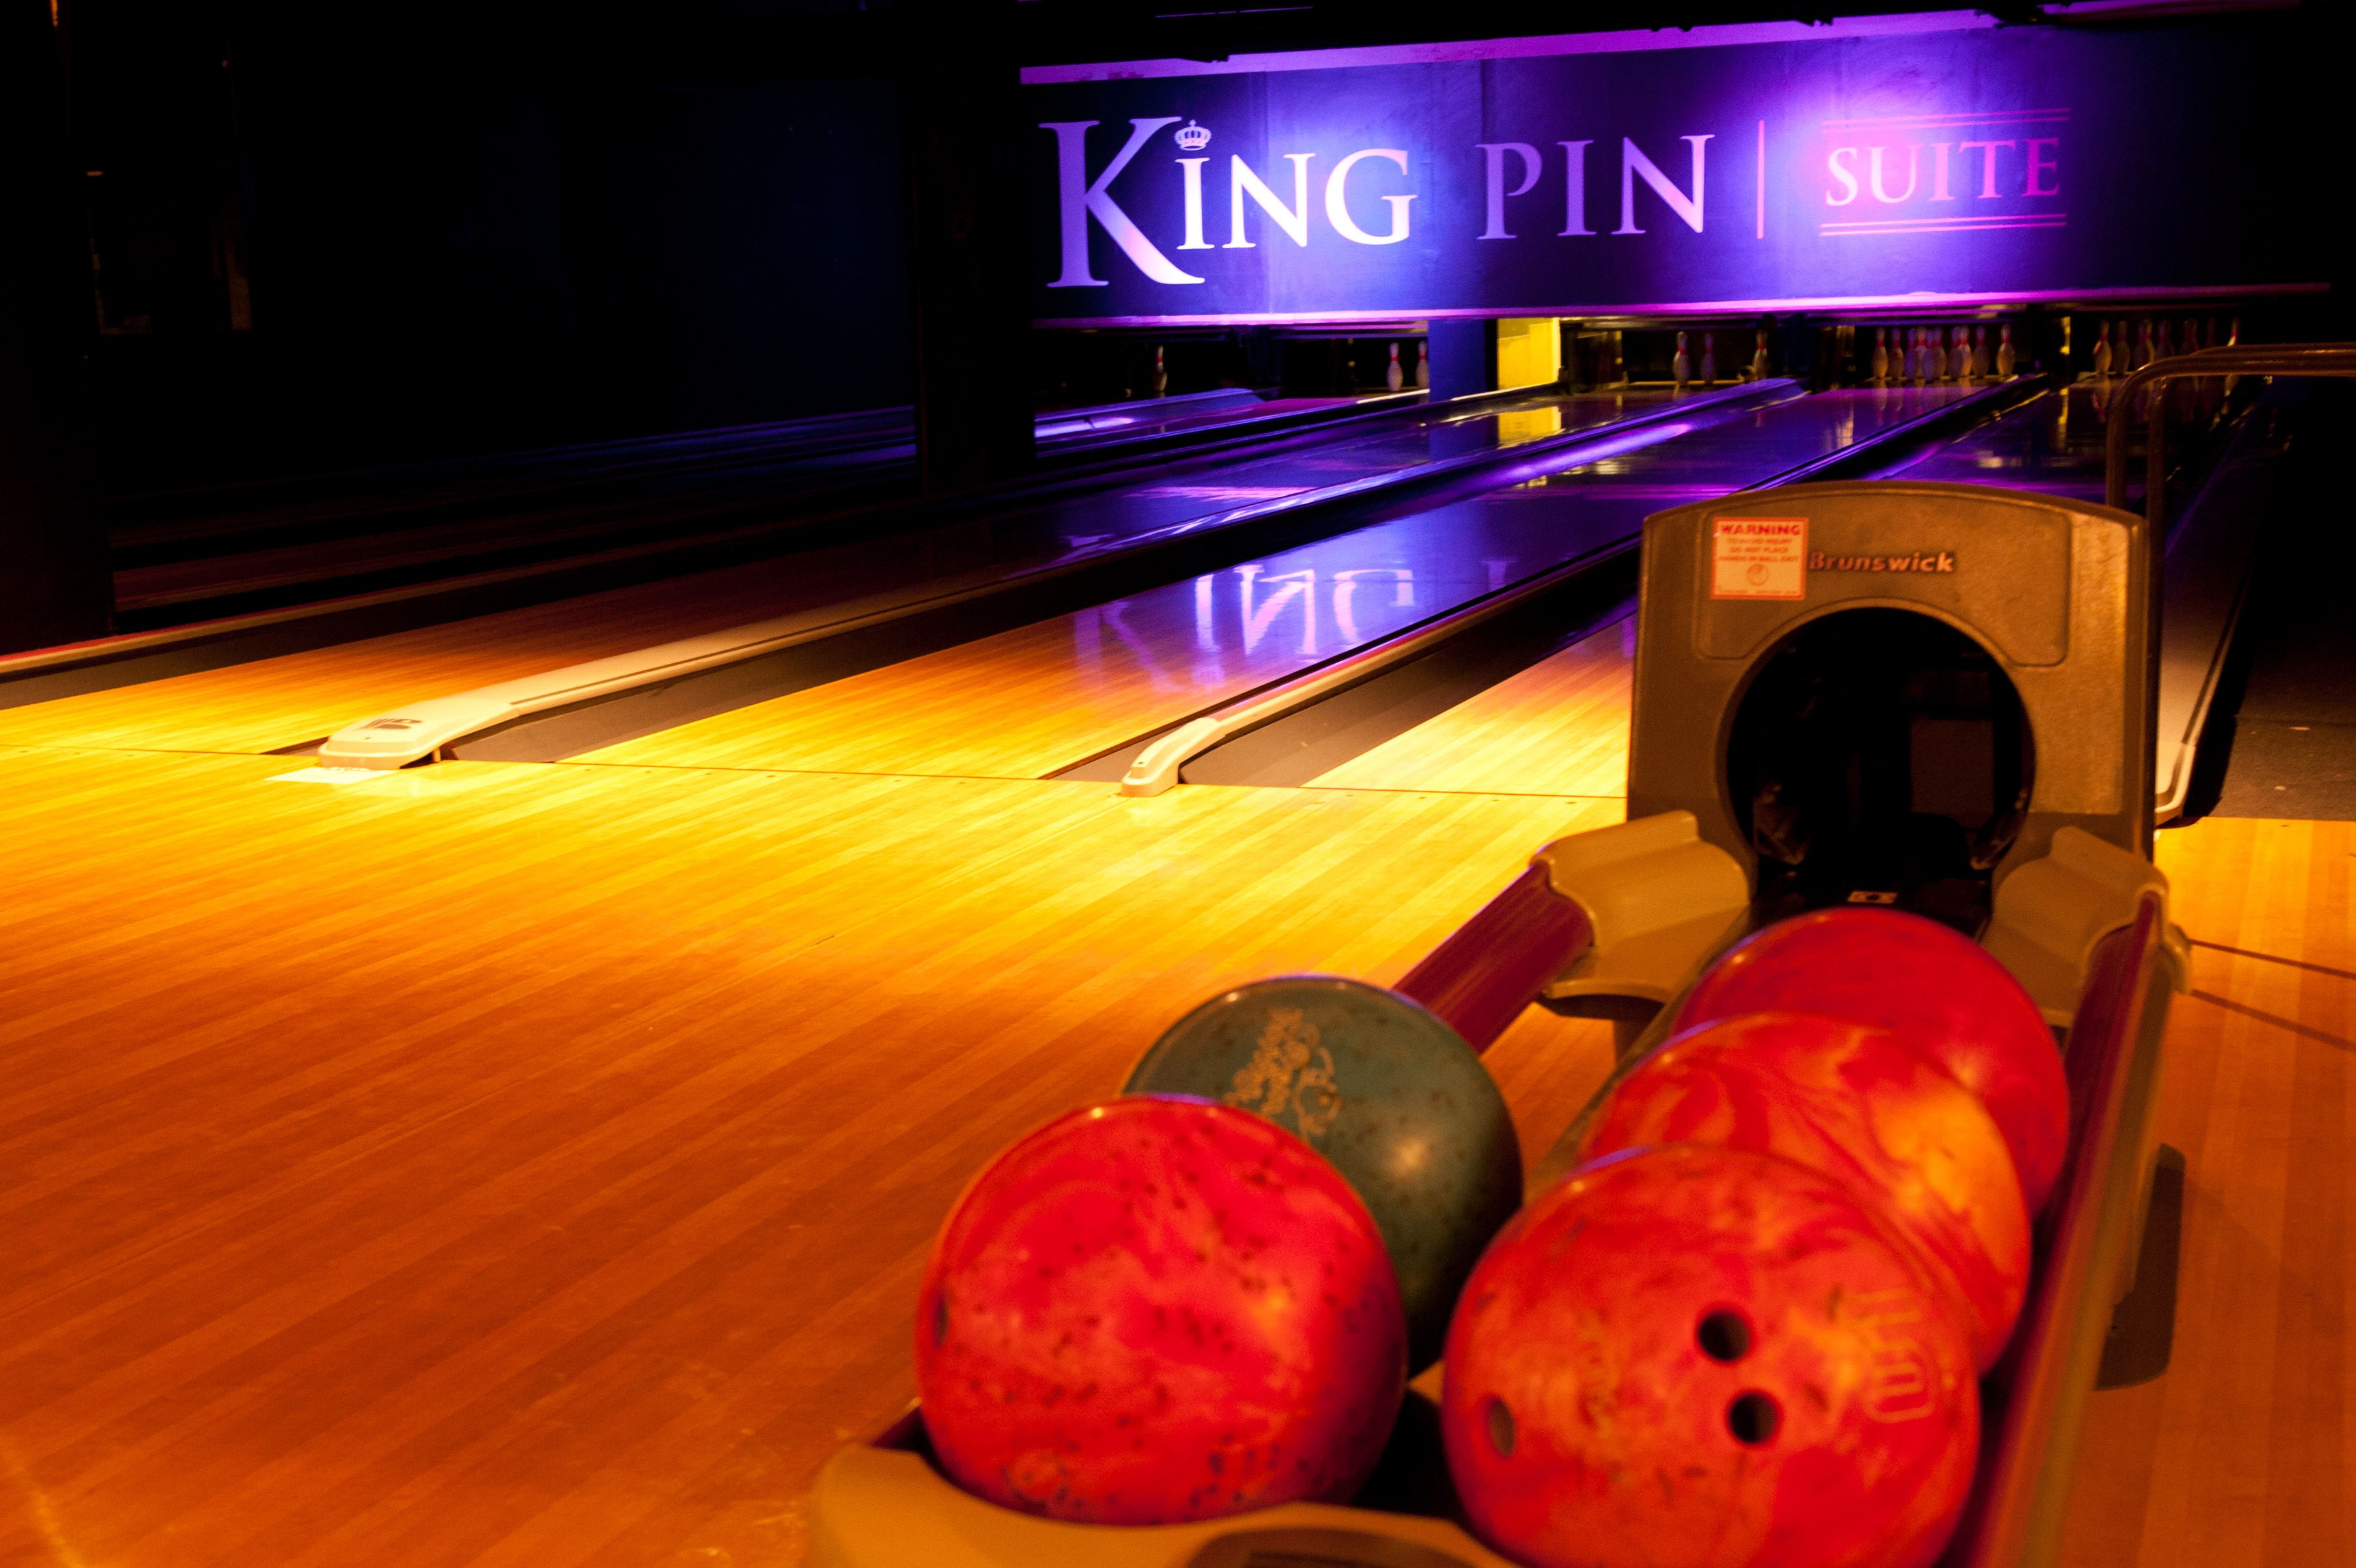 Exclusive Bowling Lanes Virtual Graffiti King Pin Graffiti Wall